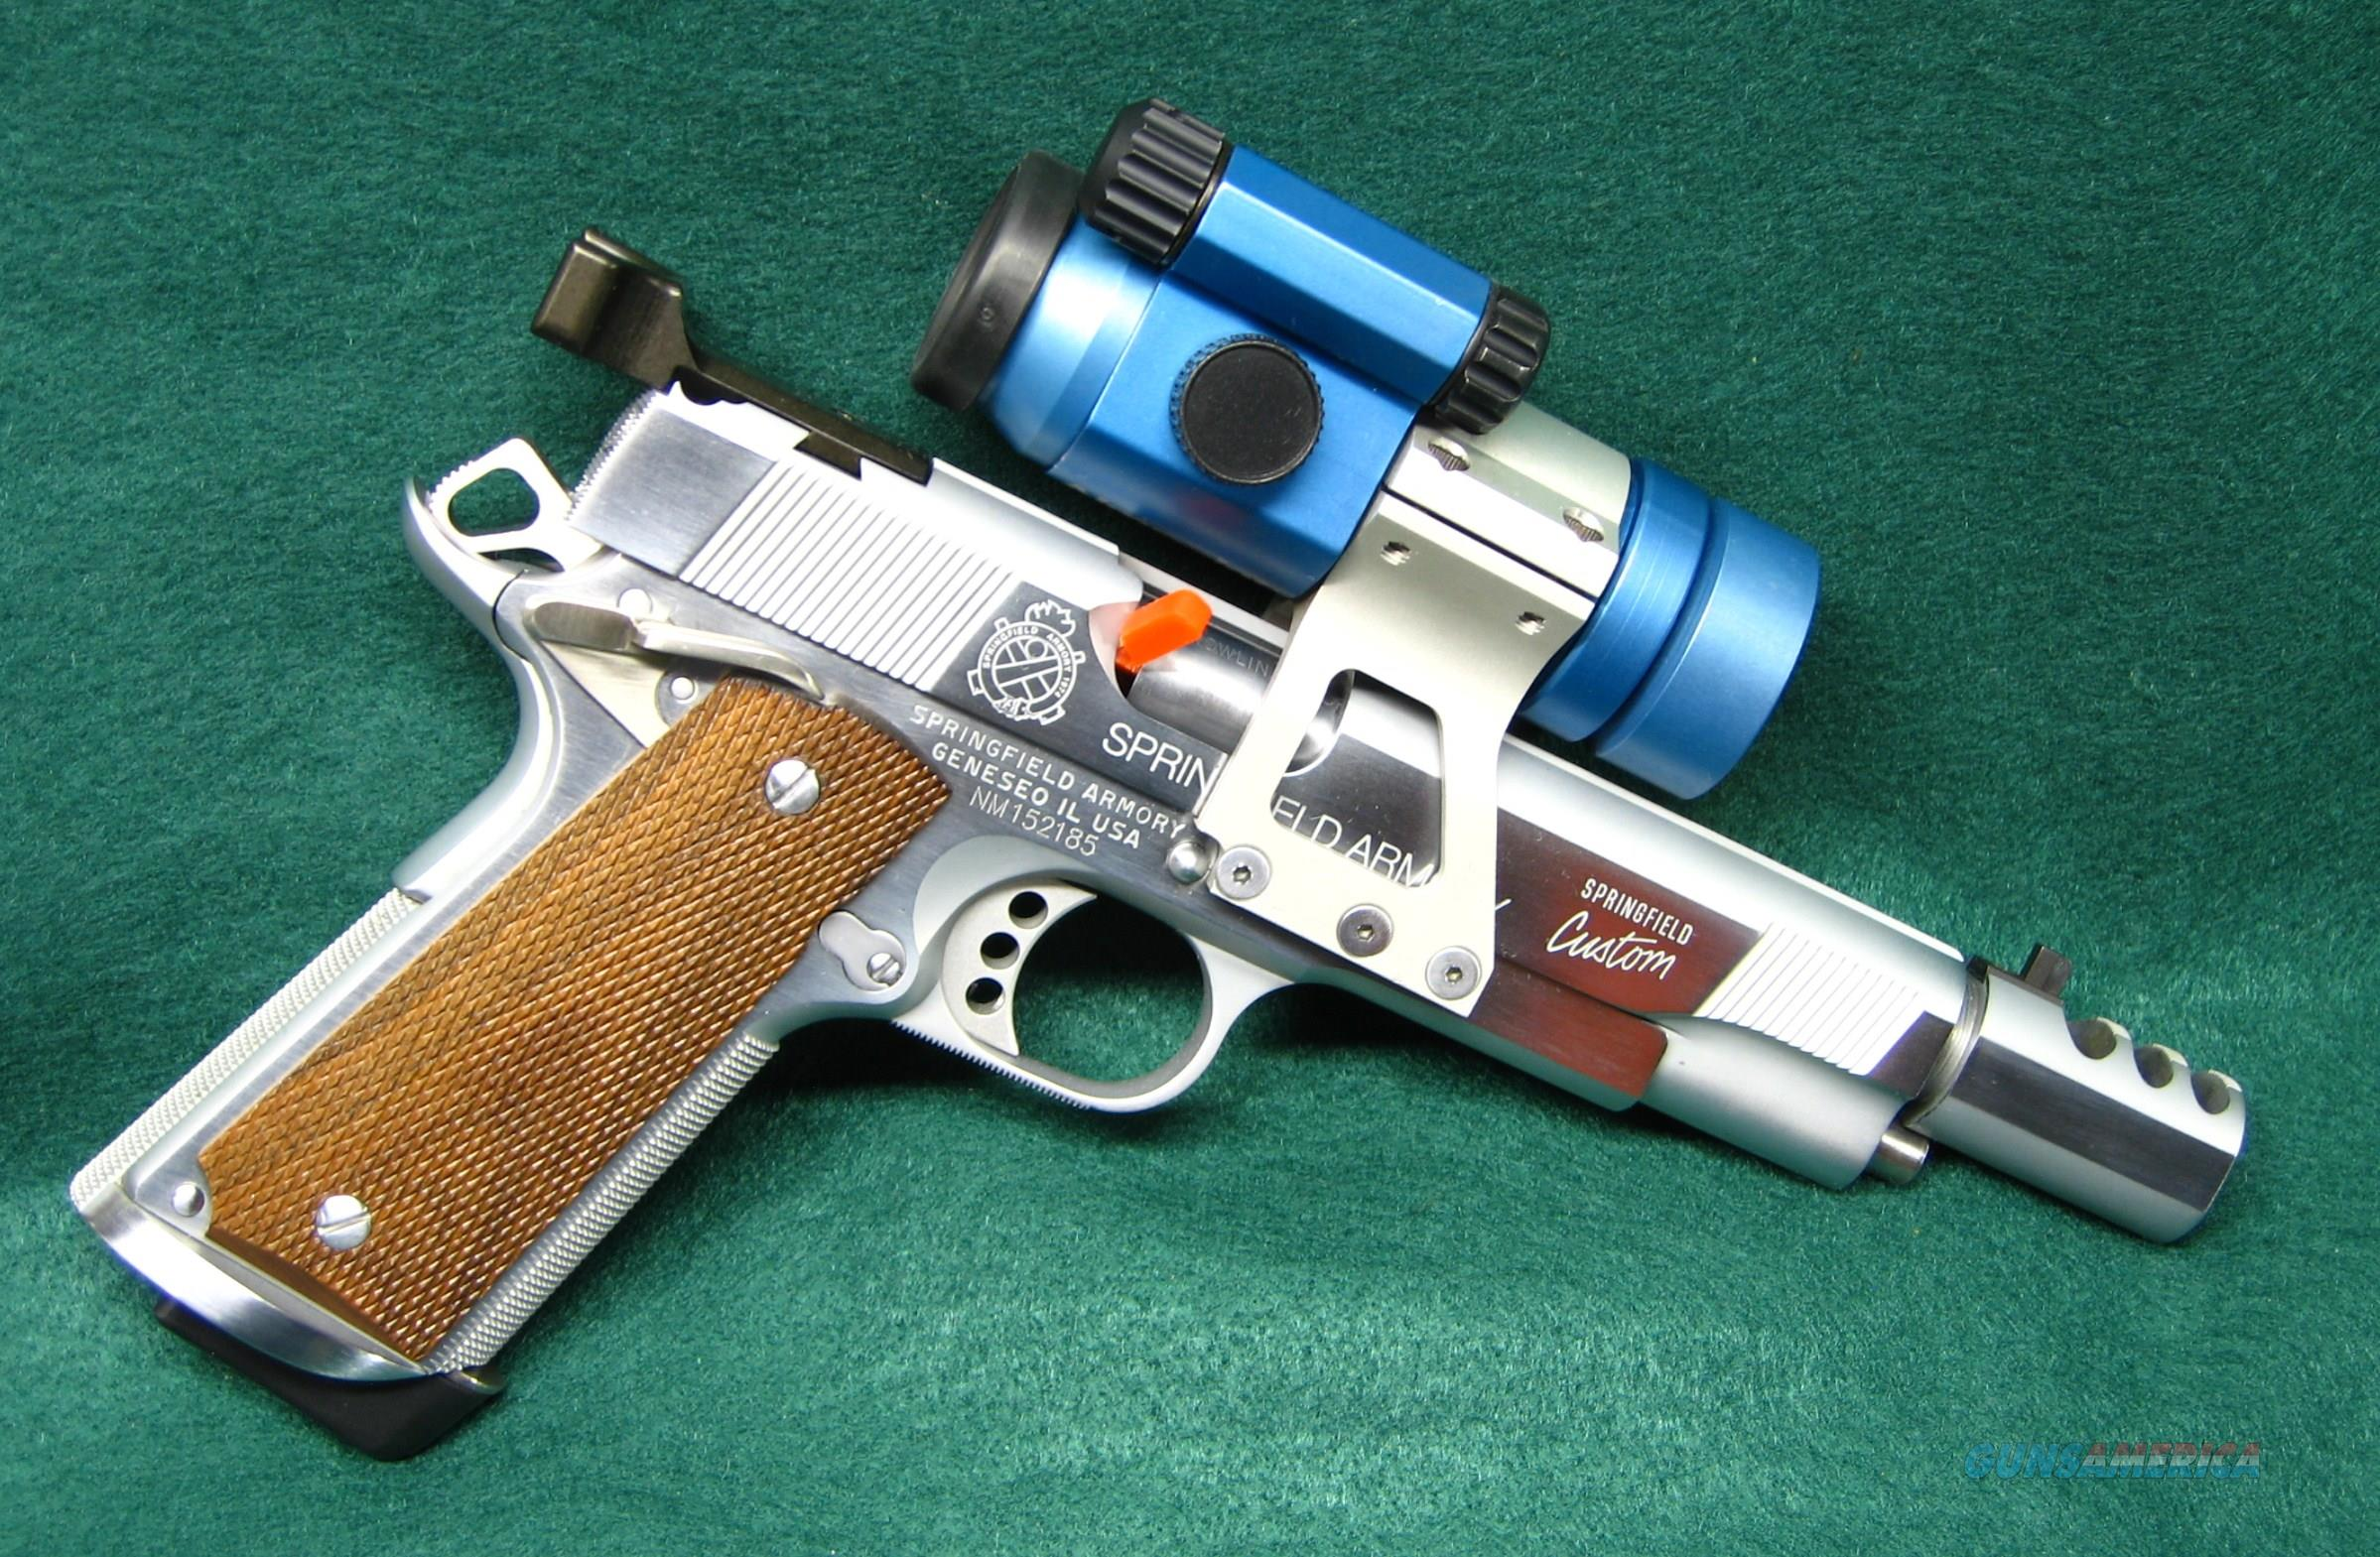 SPRINGFIELD CUSTOM DISTINGUISHED - .45ACP - RACE GUN  Guns > Pistols > Springfield Armory Pistols > 1911 Type